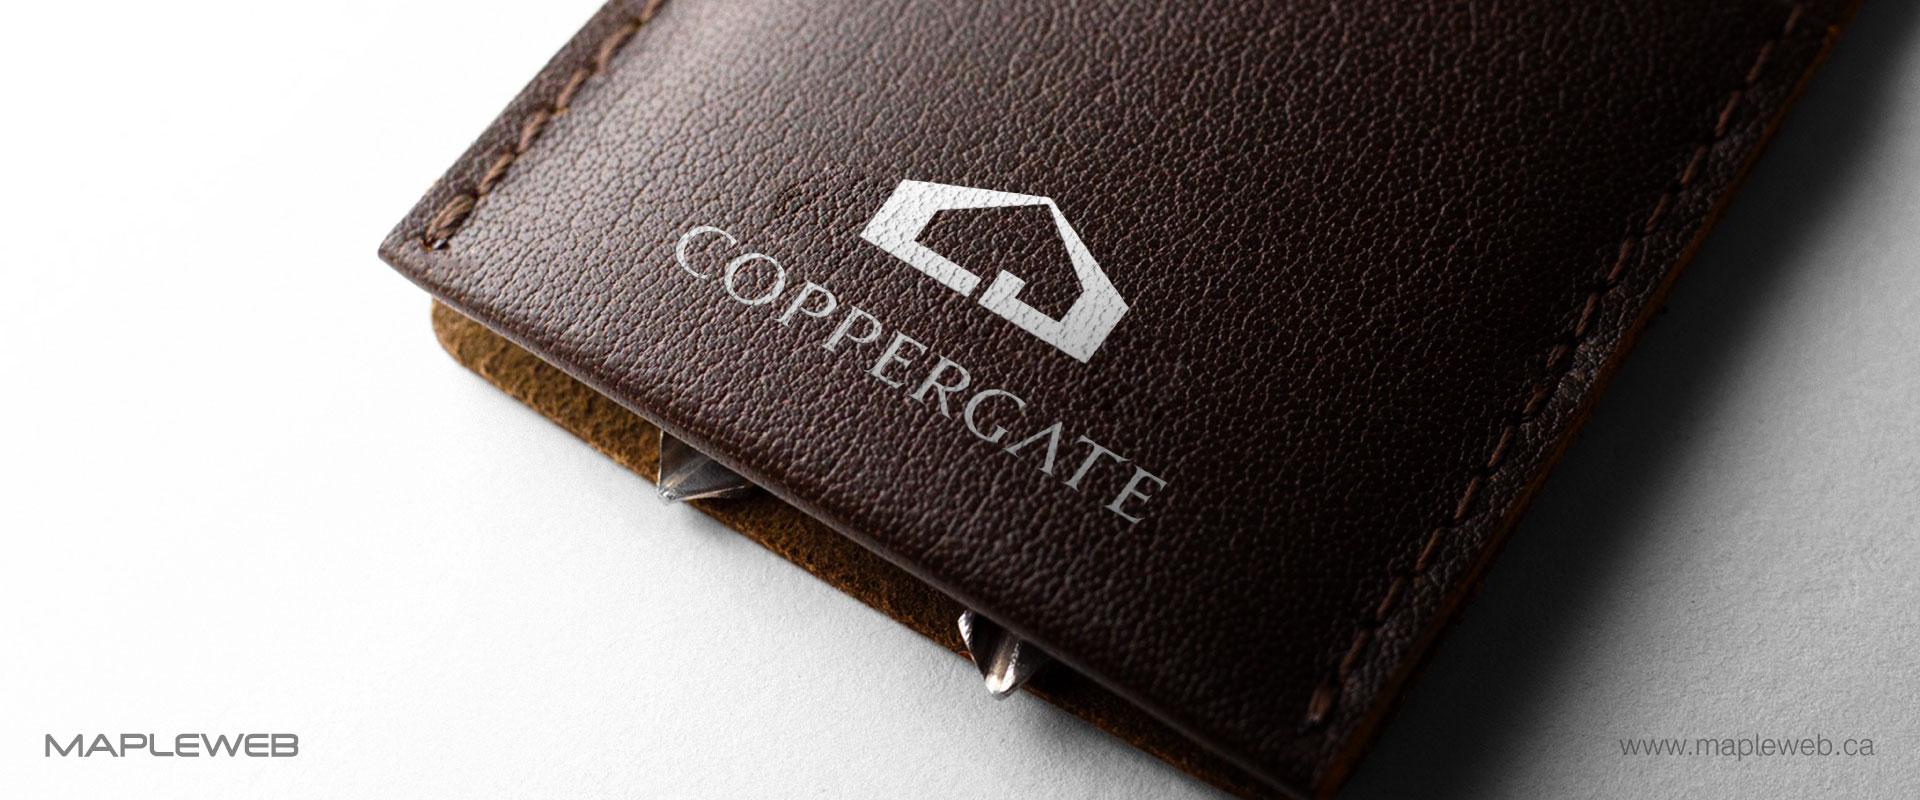 coppergate-brand-logo-design-by-mapleweb-vancouver-canada-black-folded-wallet-mock